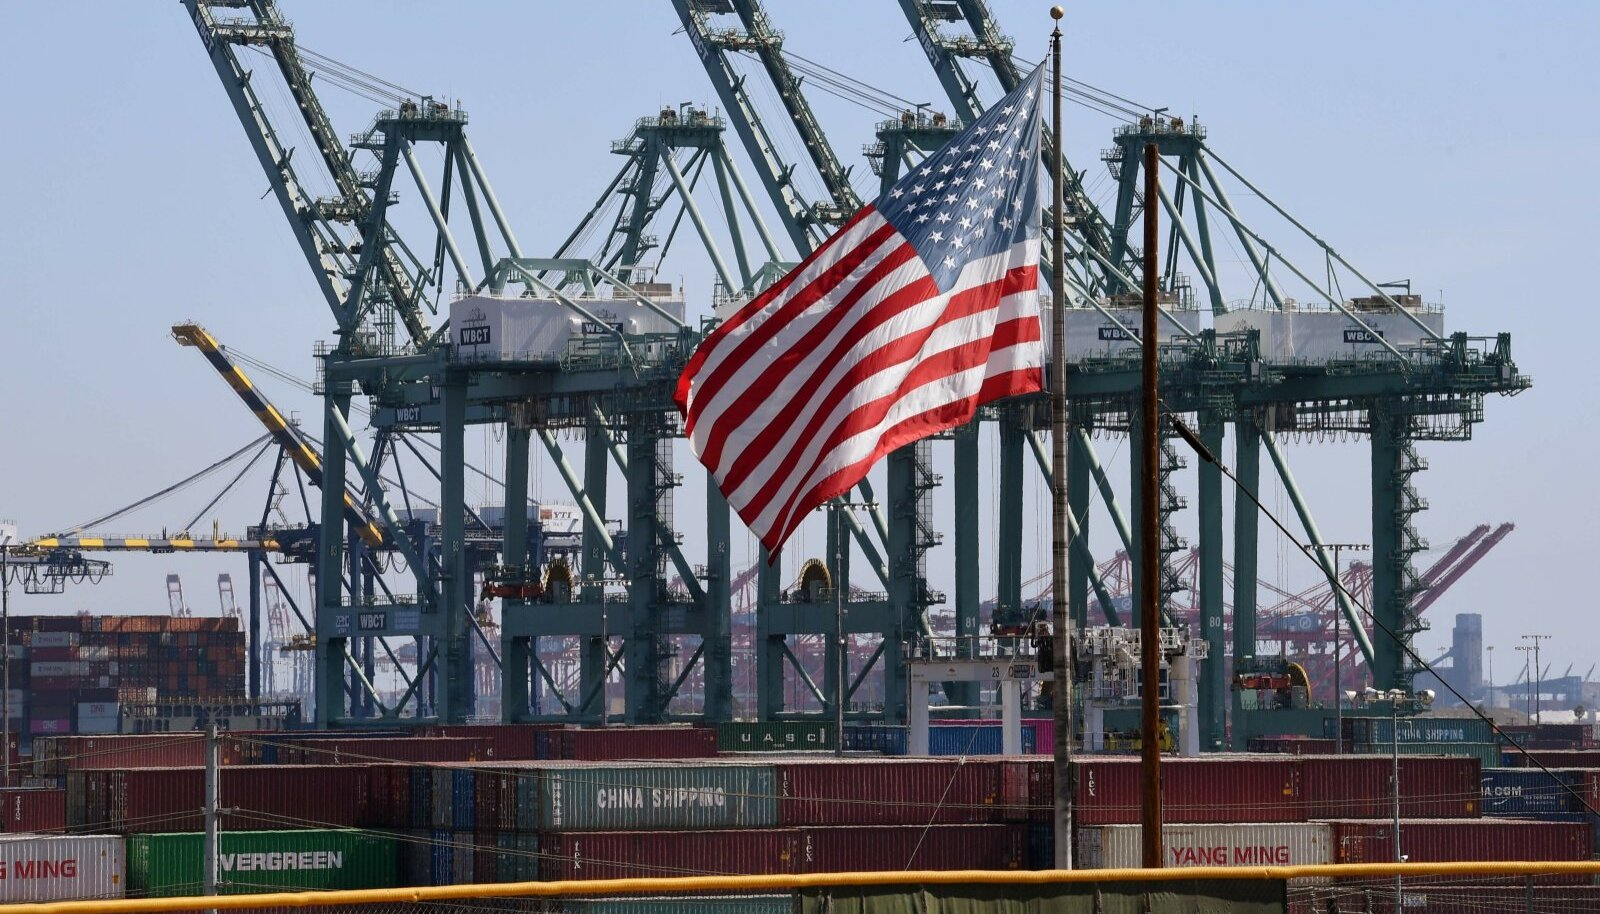 Hiina merekonteinerid Los Angelese Long Beachi sadamas.